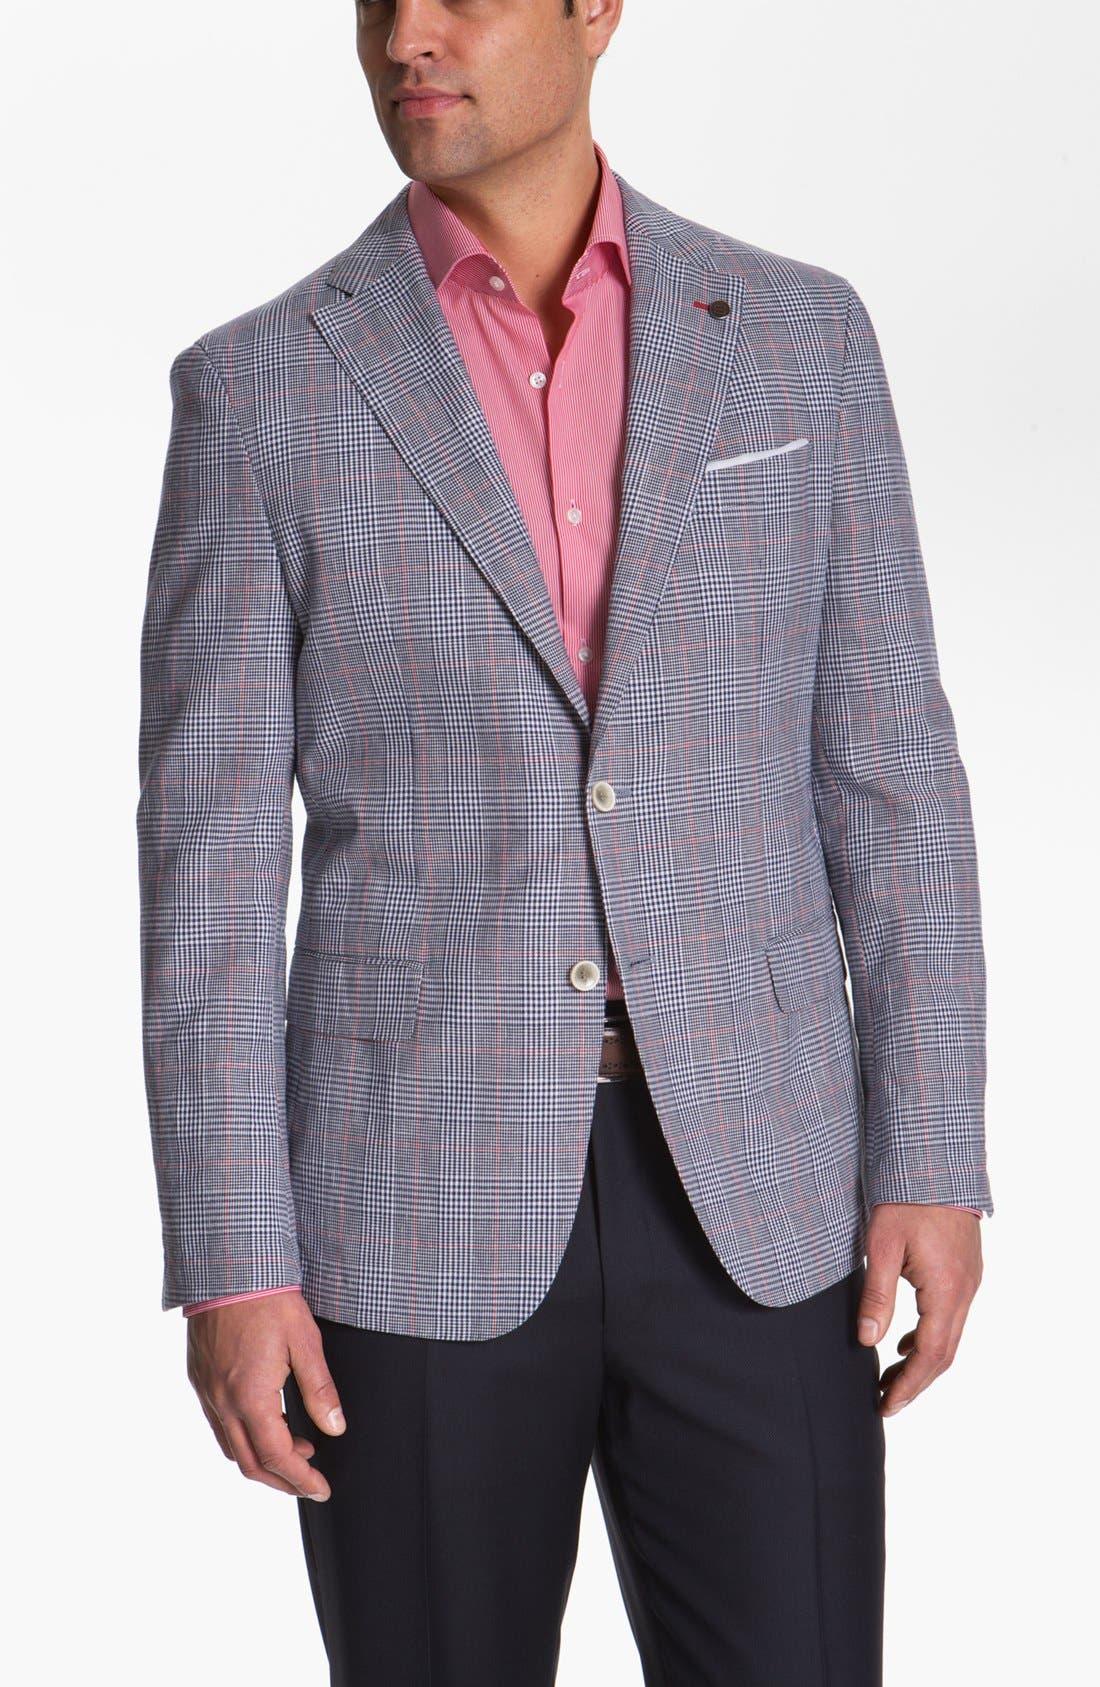 Main Image - BOSS HUGO BOSS 'Lanyon' Trim Fit Plaid Sportcoat